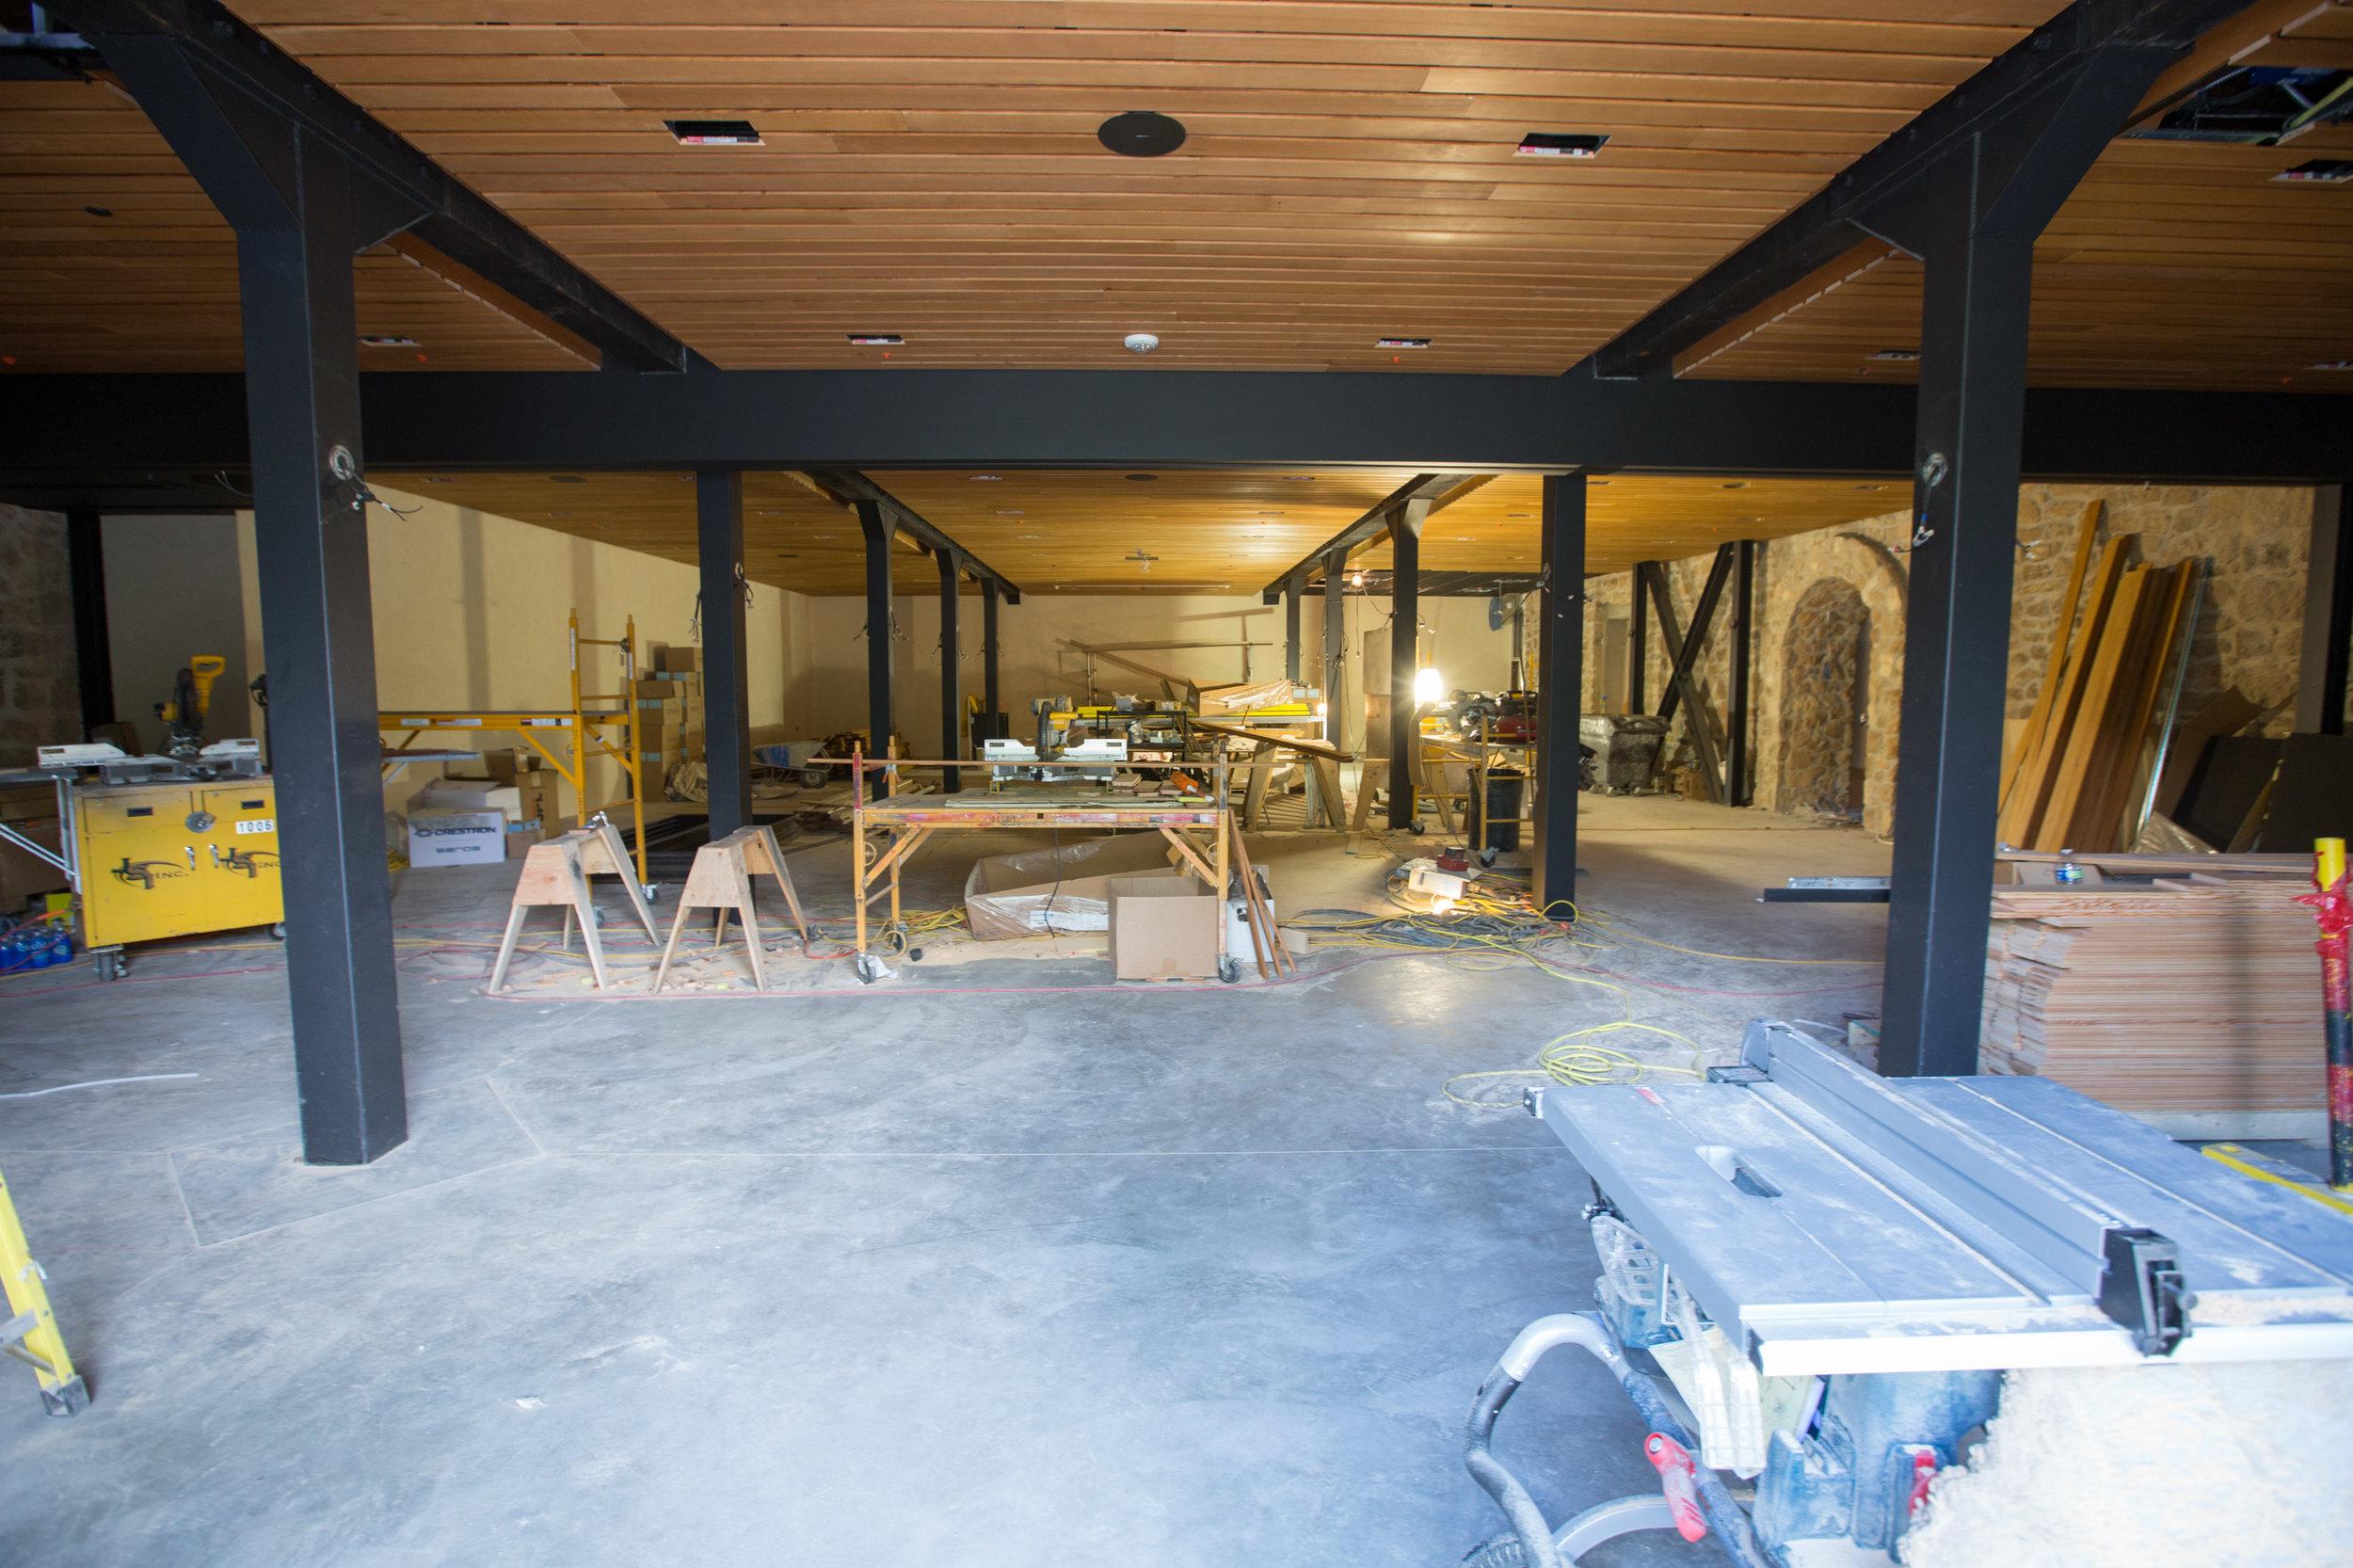 FMA_construction-day1_AI9A5242_lo.jpg